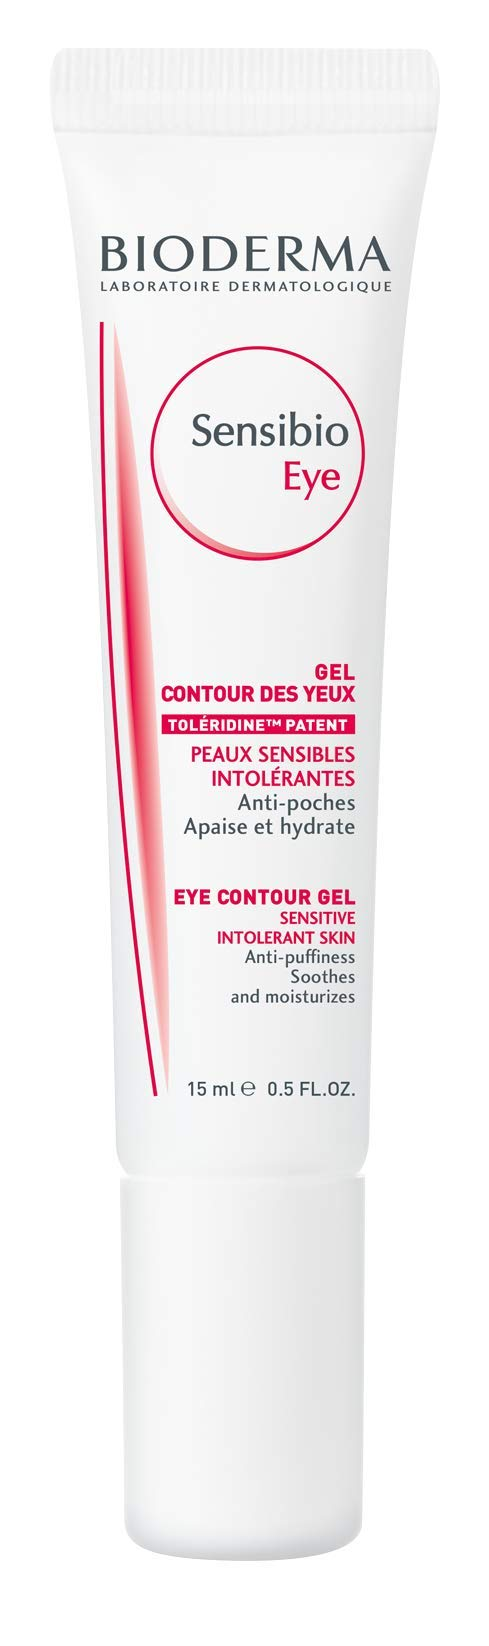 Bioderma Sensibio Anti-Puffiness Soothing and Moisturizing Eye Contour Gel for Sensitive Skin - 0.5 FL.OZ. by Bioderma